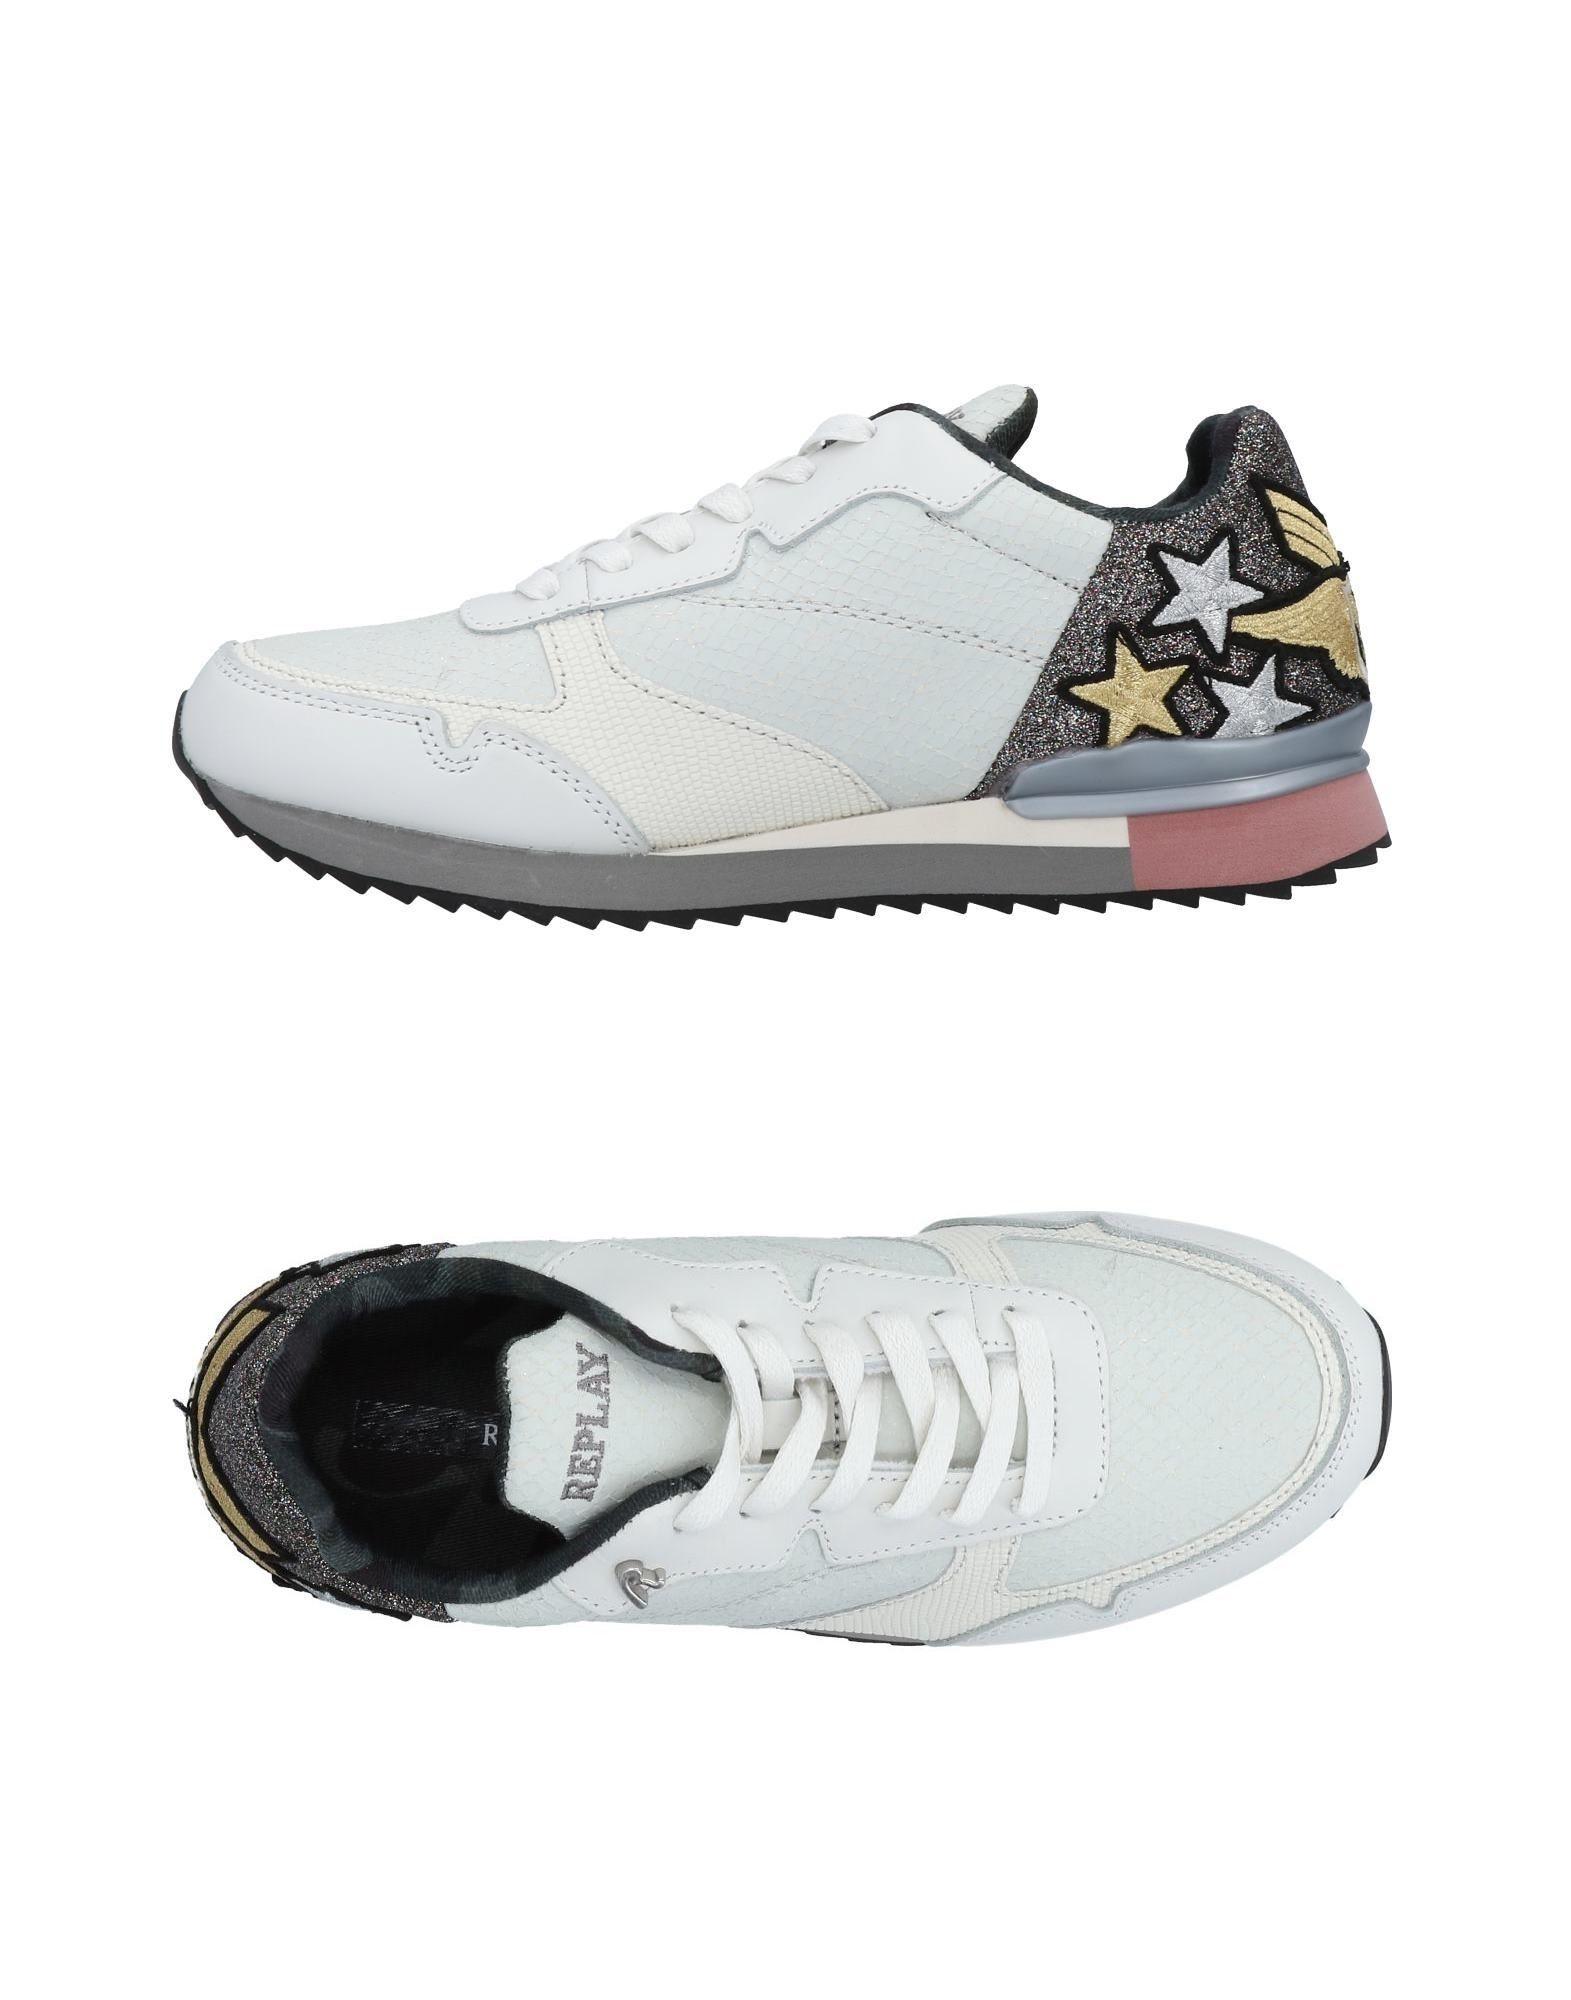 Replay Sneakers Gute Damen  11493362IK Gute Sneakers Qualität beliebte Schuhe 27ced2